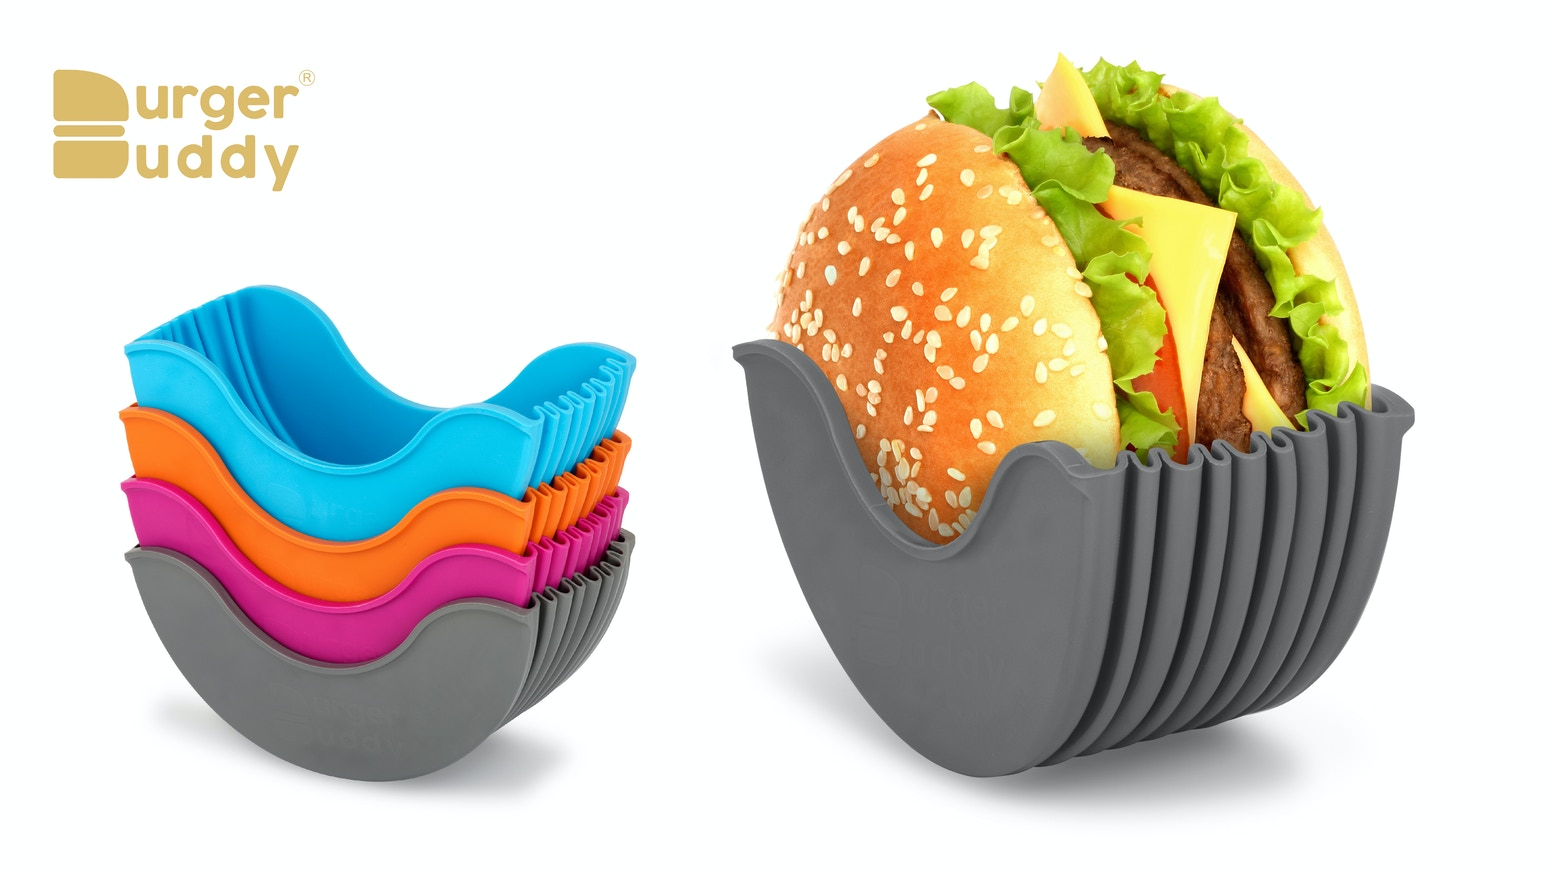 Hygienic | Eco-friendly | Mess-free | Dishwasher safe | Expandable | Patent-pending design